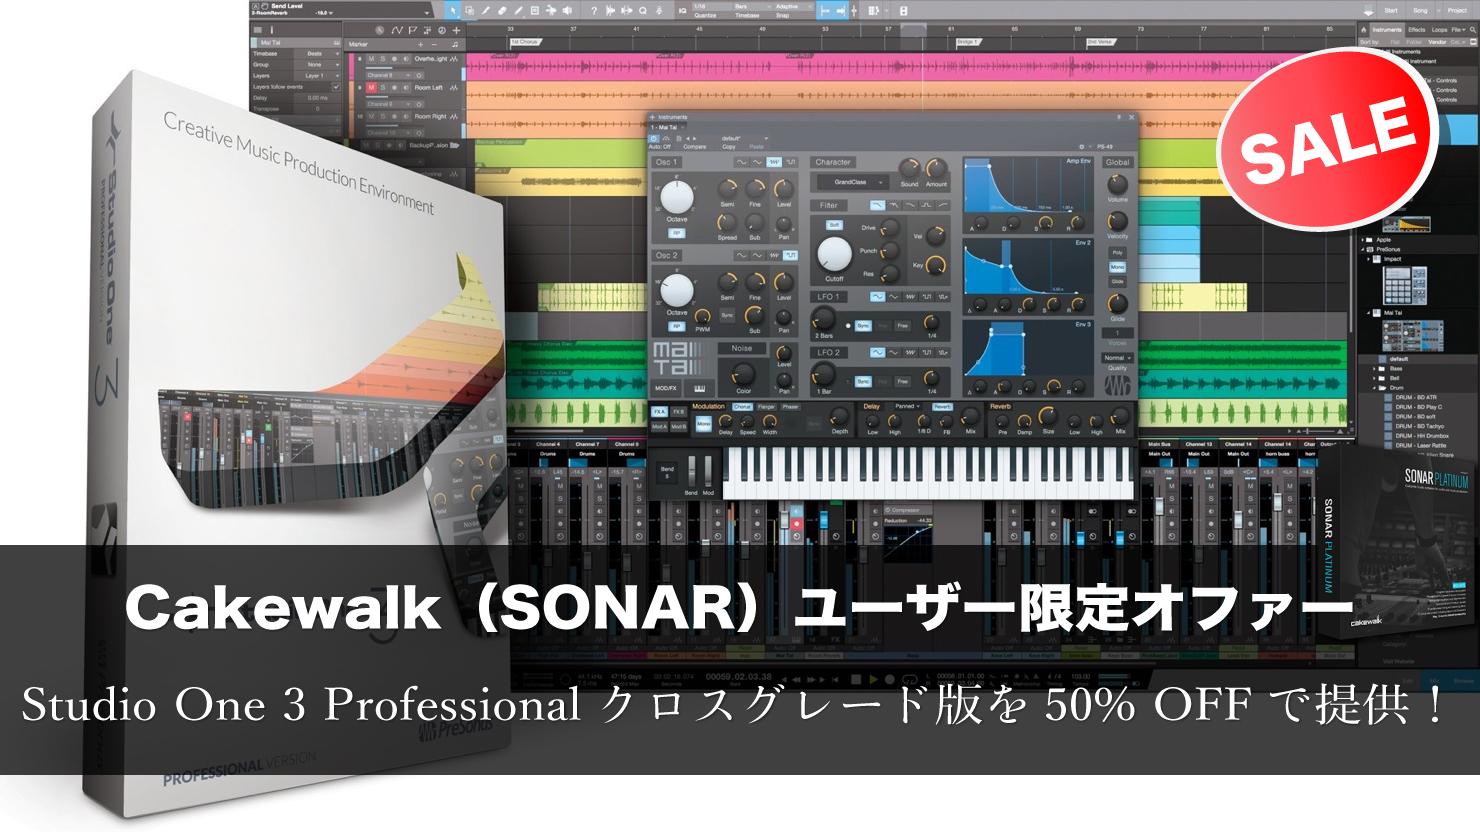 Cakewalk(SONAR)ユーザー限定オファー Studio One 3 Professionalクロスグレード版を50% OFFで提供!